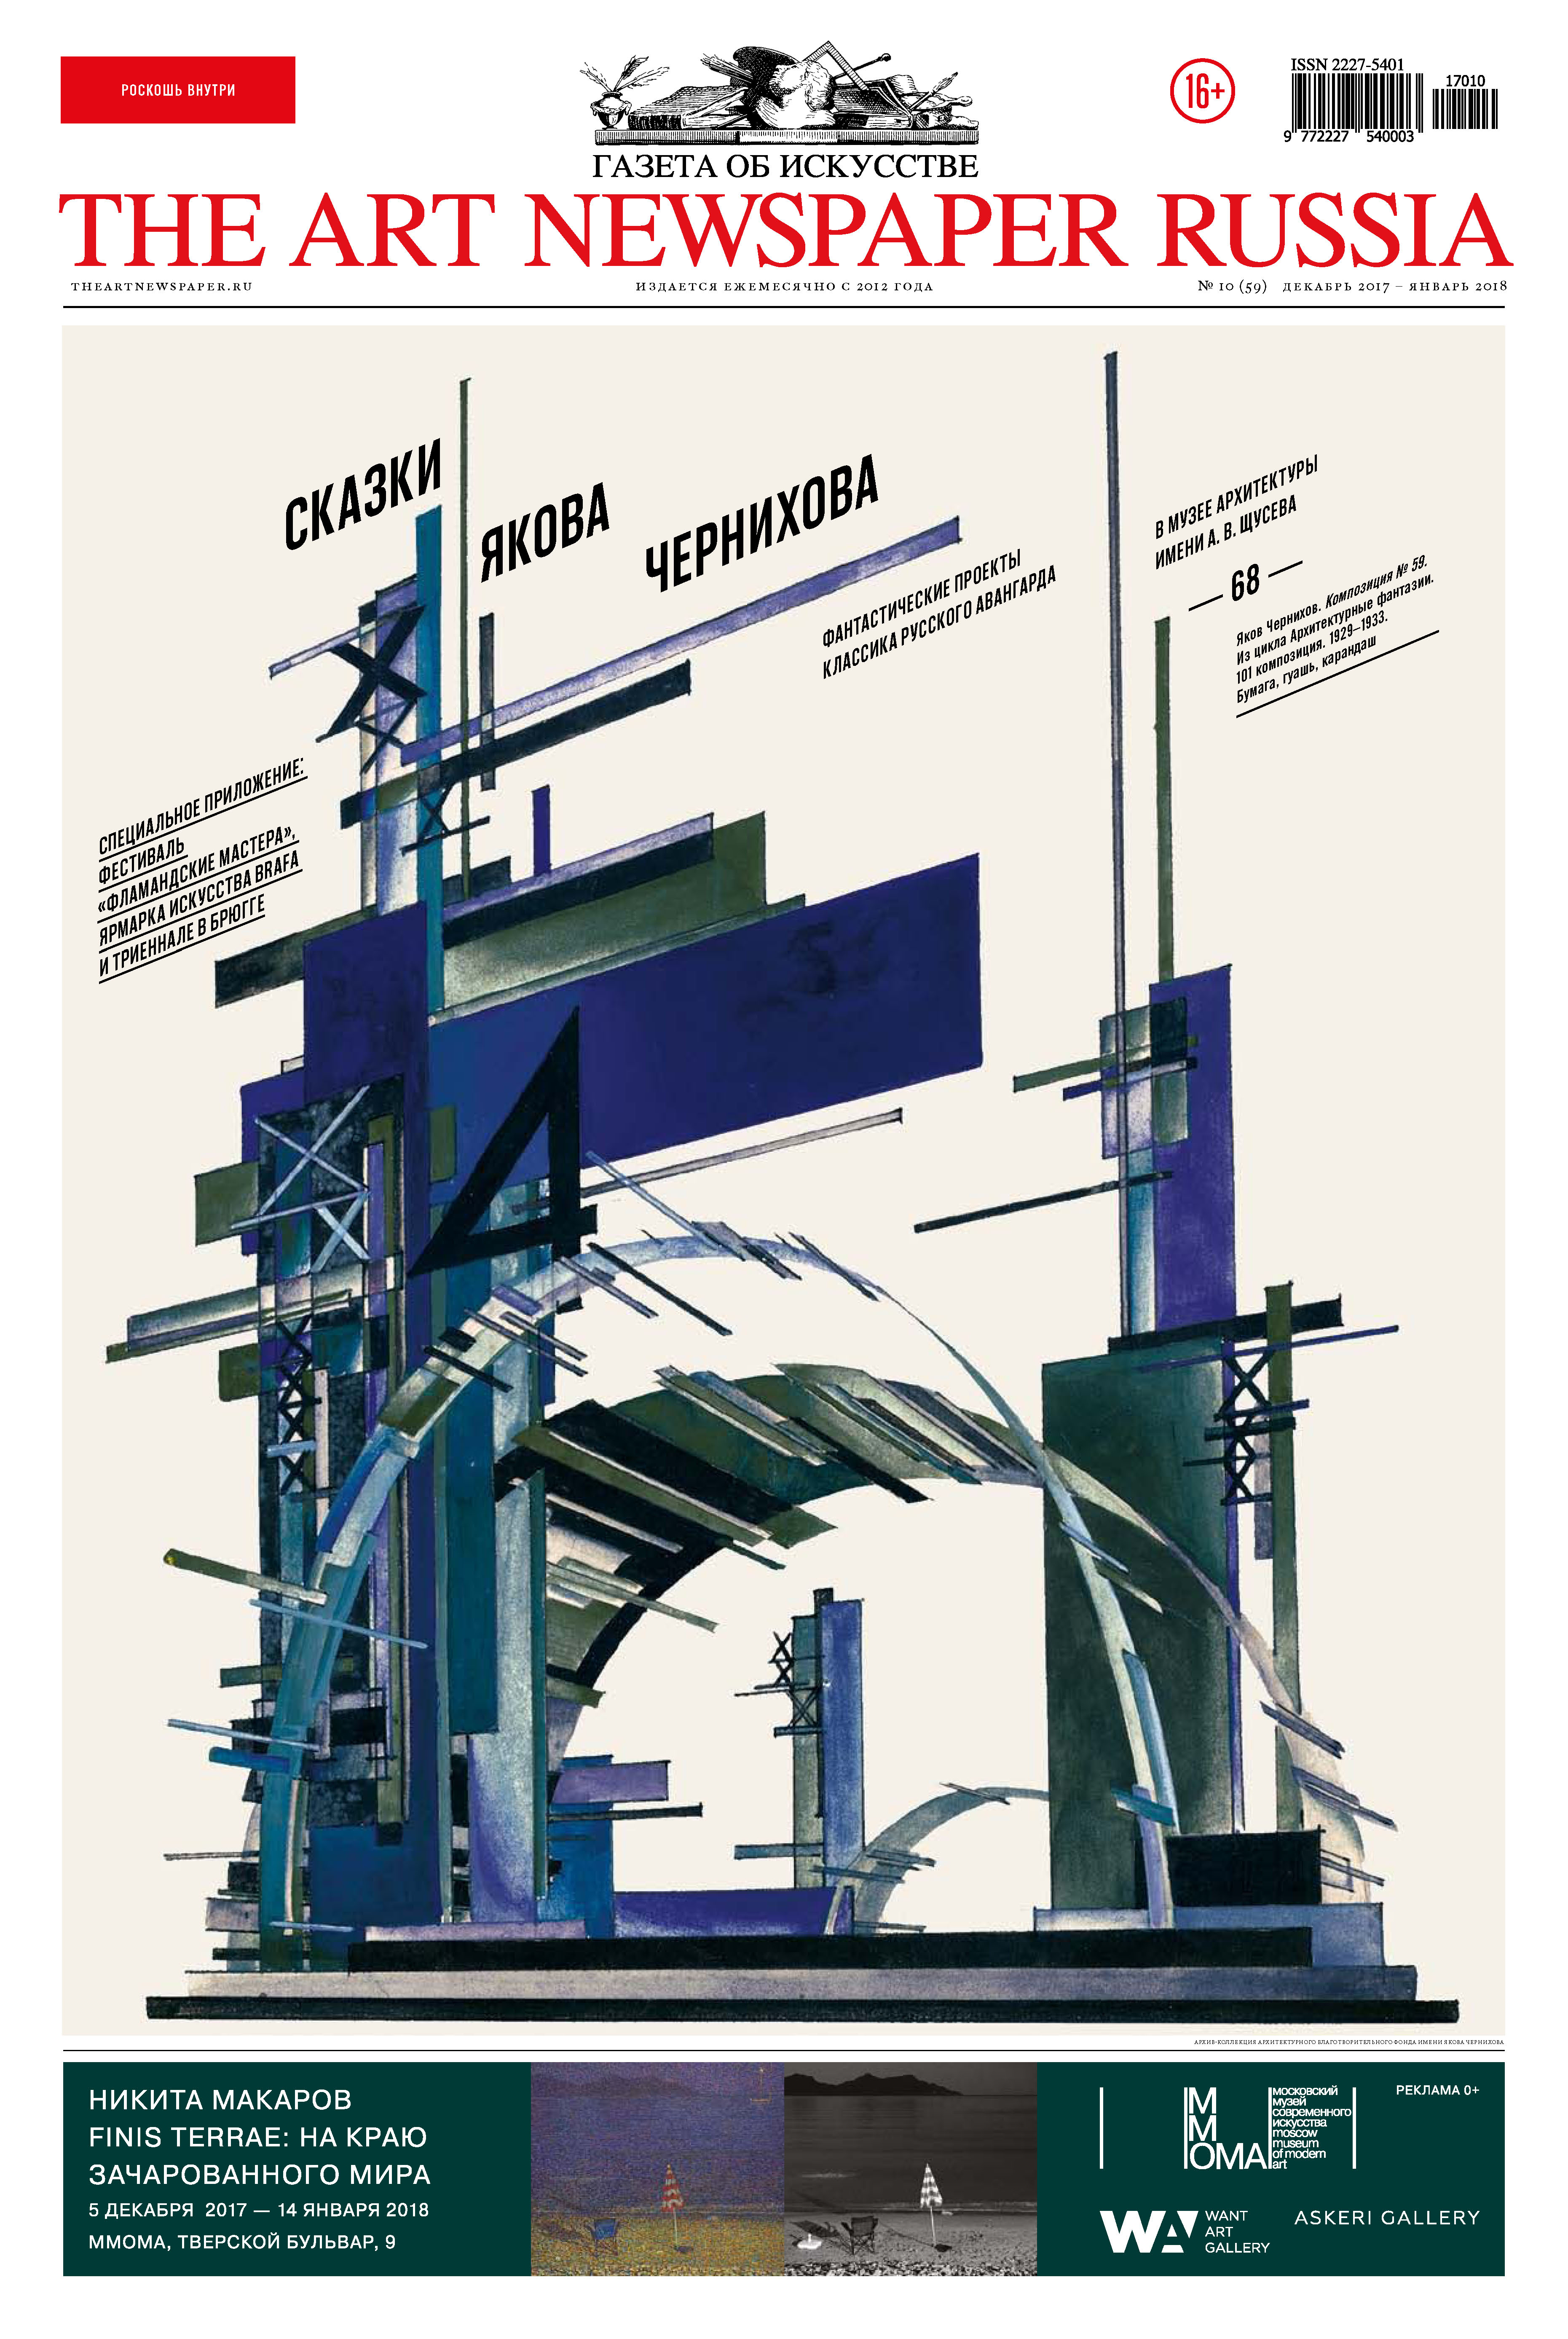 Отсутствует The Art Newspaper Russia №10 / декабрь 2017 – январь 2018 отсутствует the art newspaper russia 10 декабрь 2013 – январь 2014